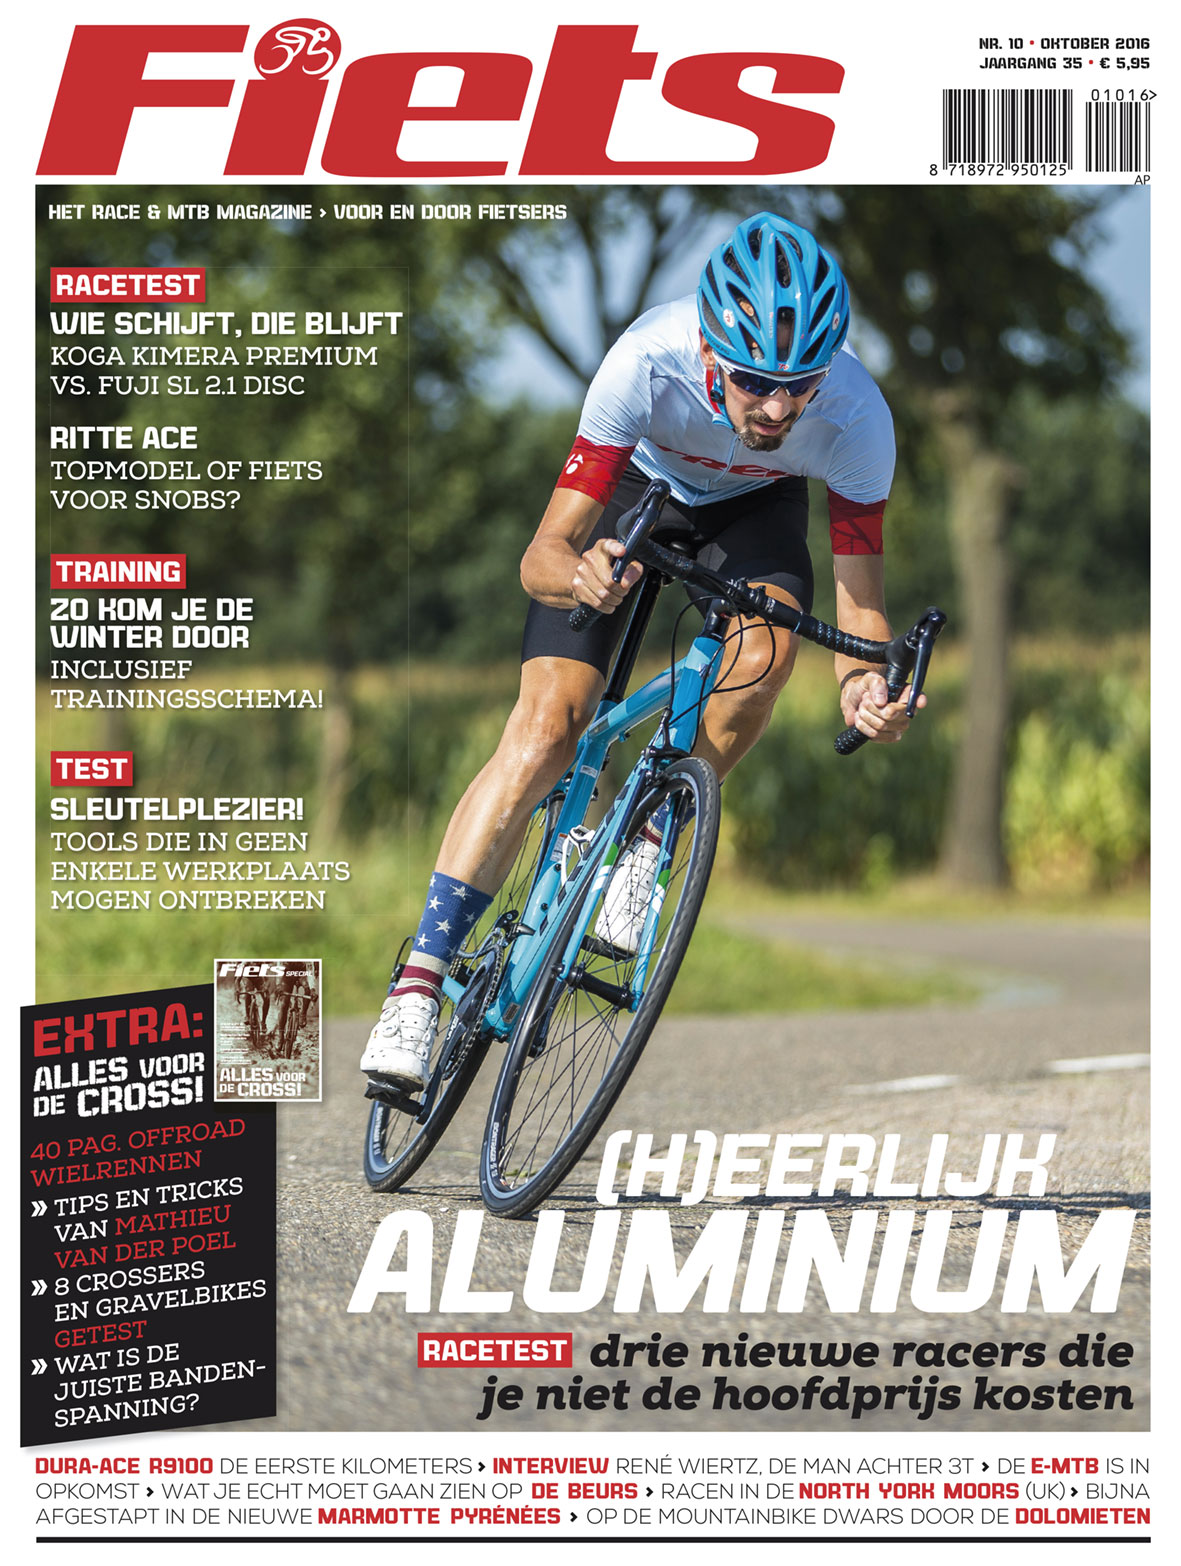 Fiets editie 10 - oktober 2016 + Cyclocross Special